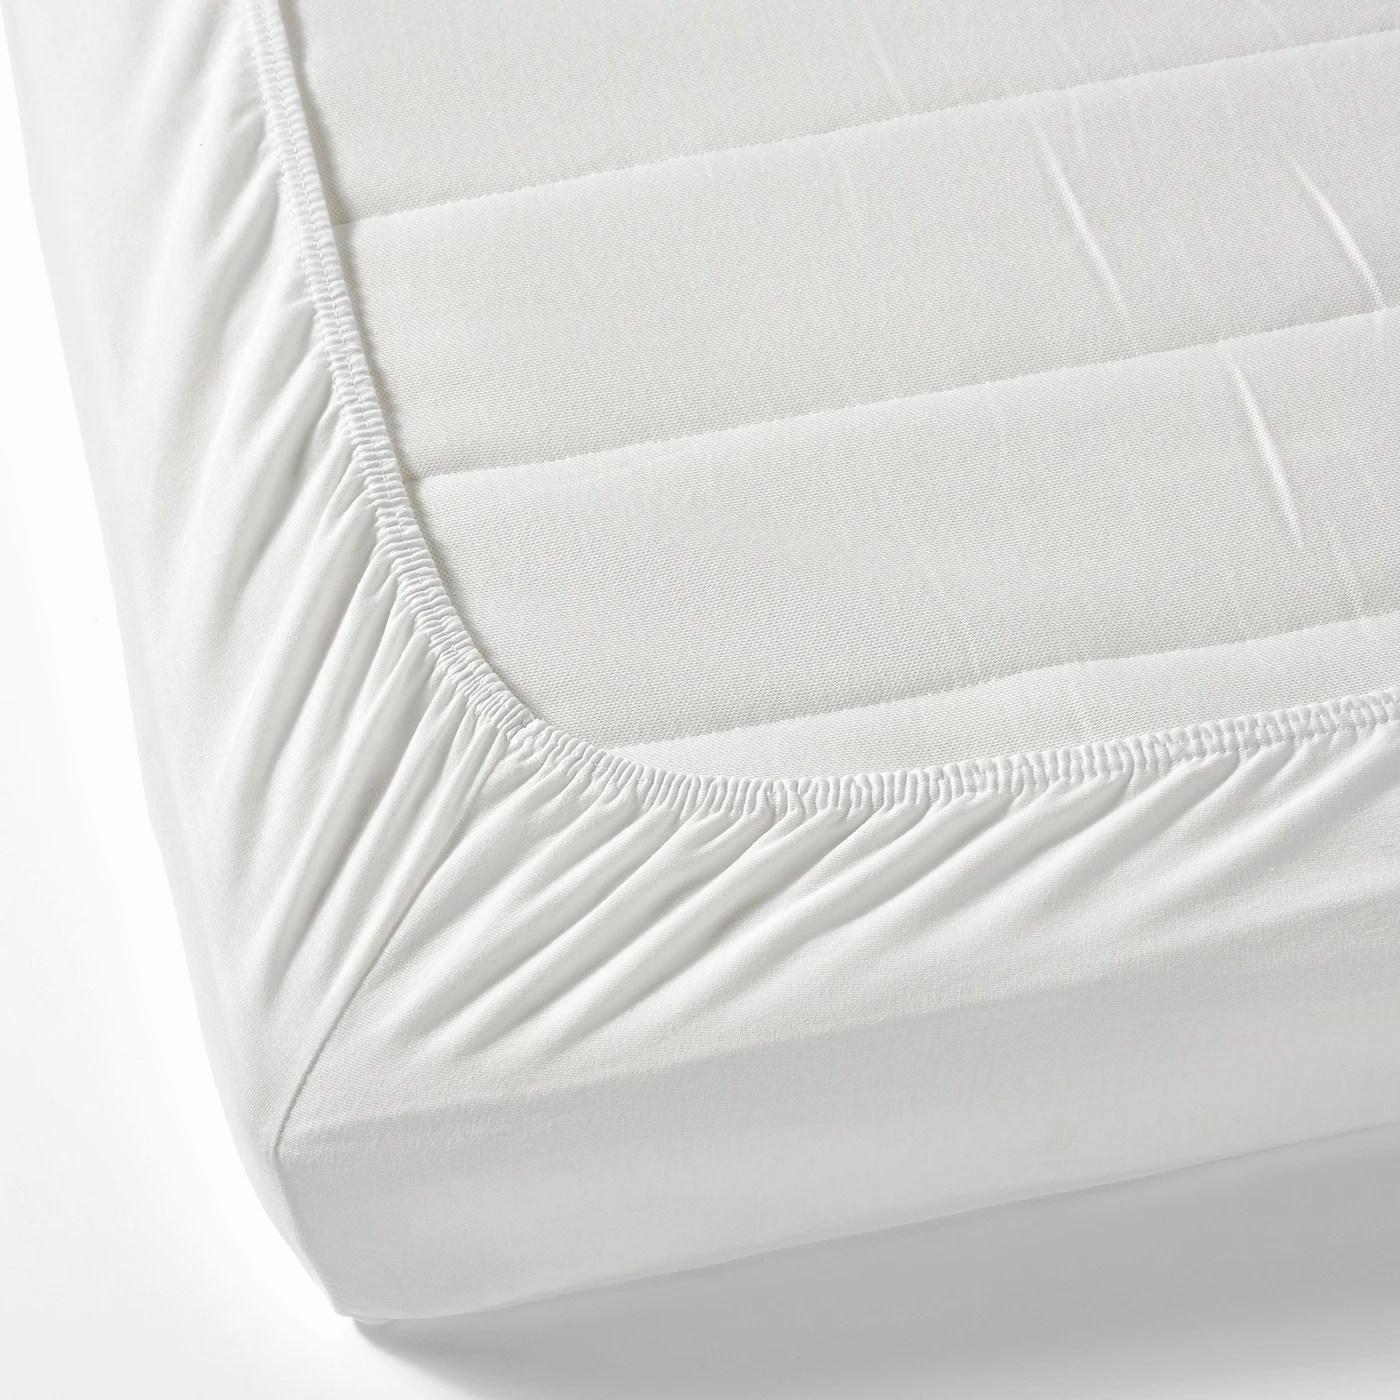 Len Drap Housse Blanc 70x160 Cm Materiau Durable Ikea